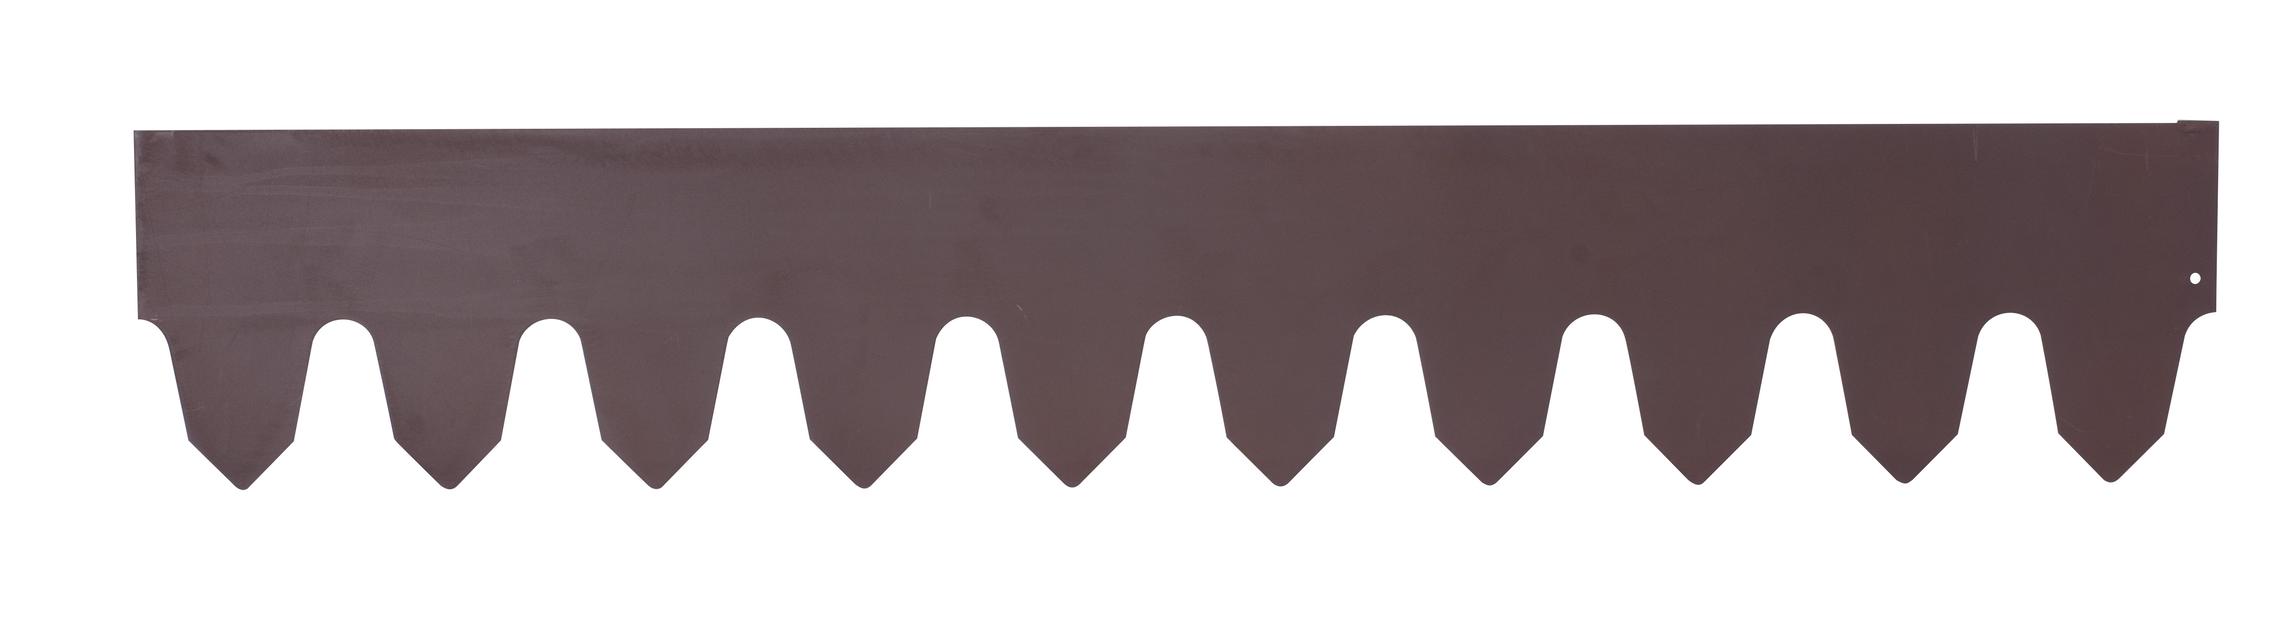 Plenkant 4 m, brun